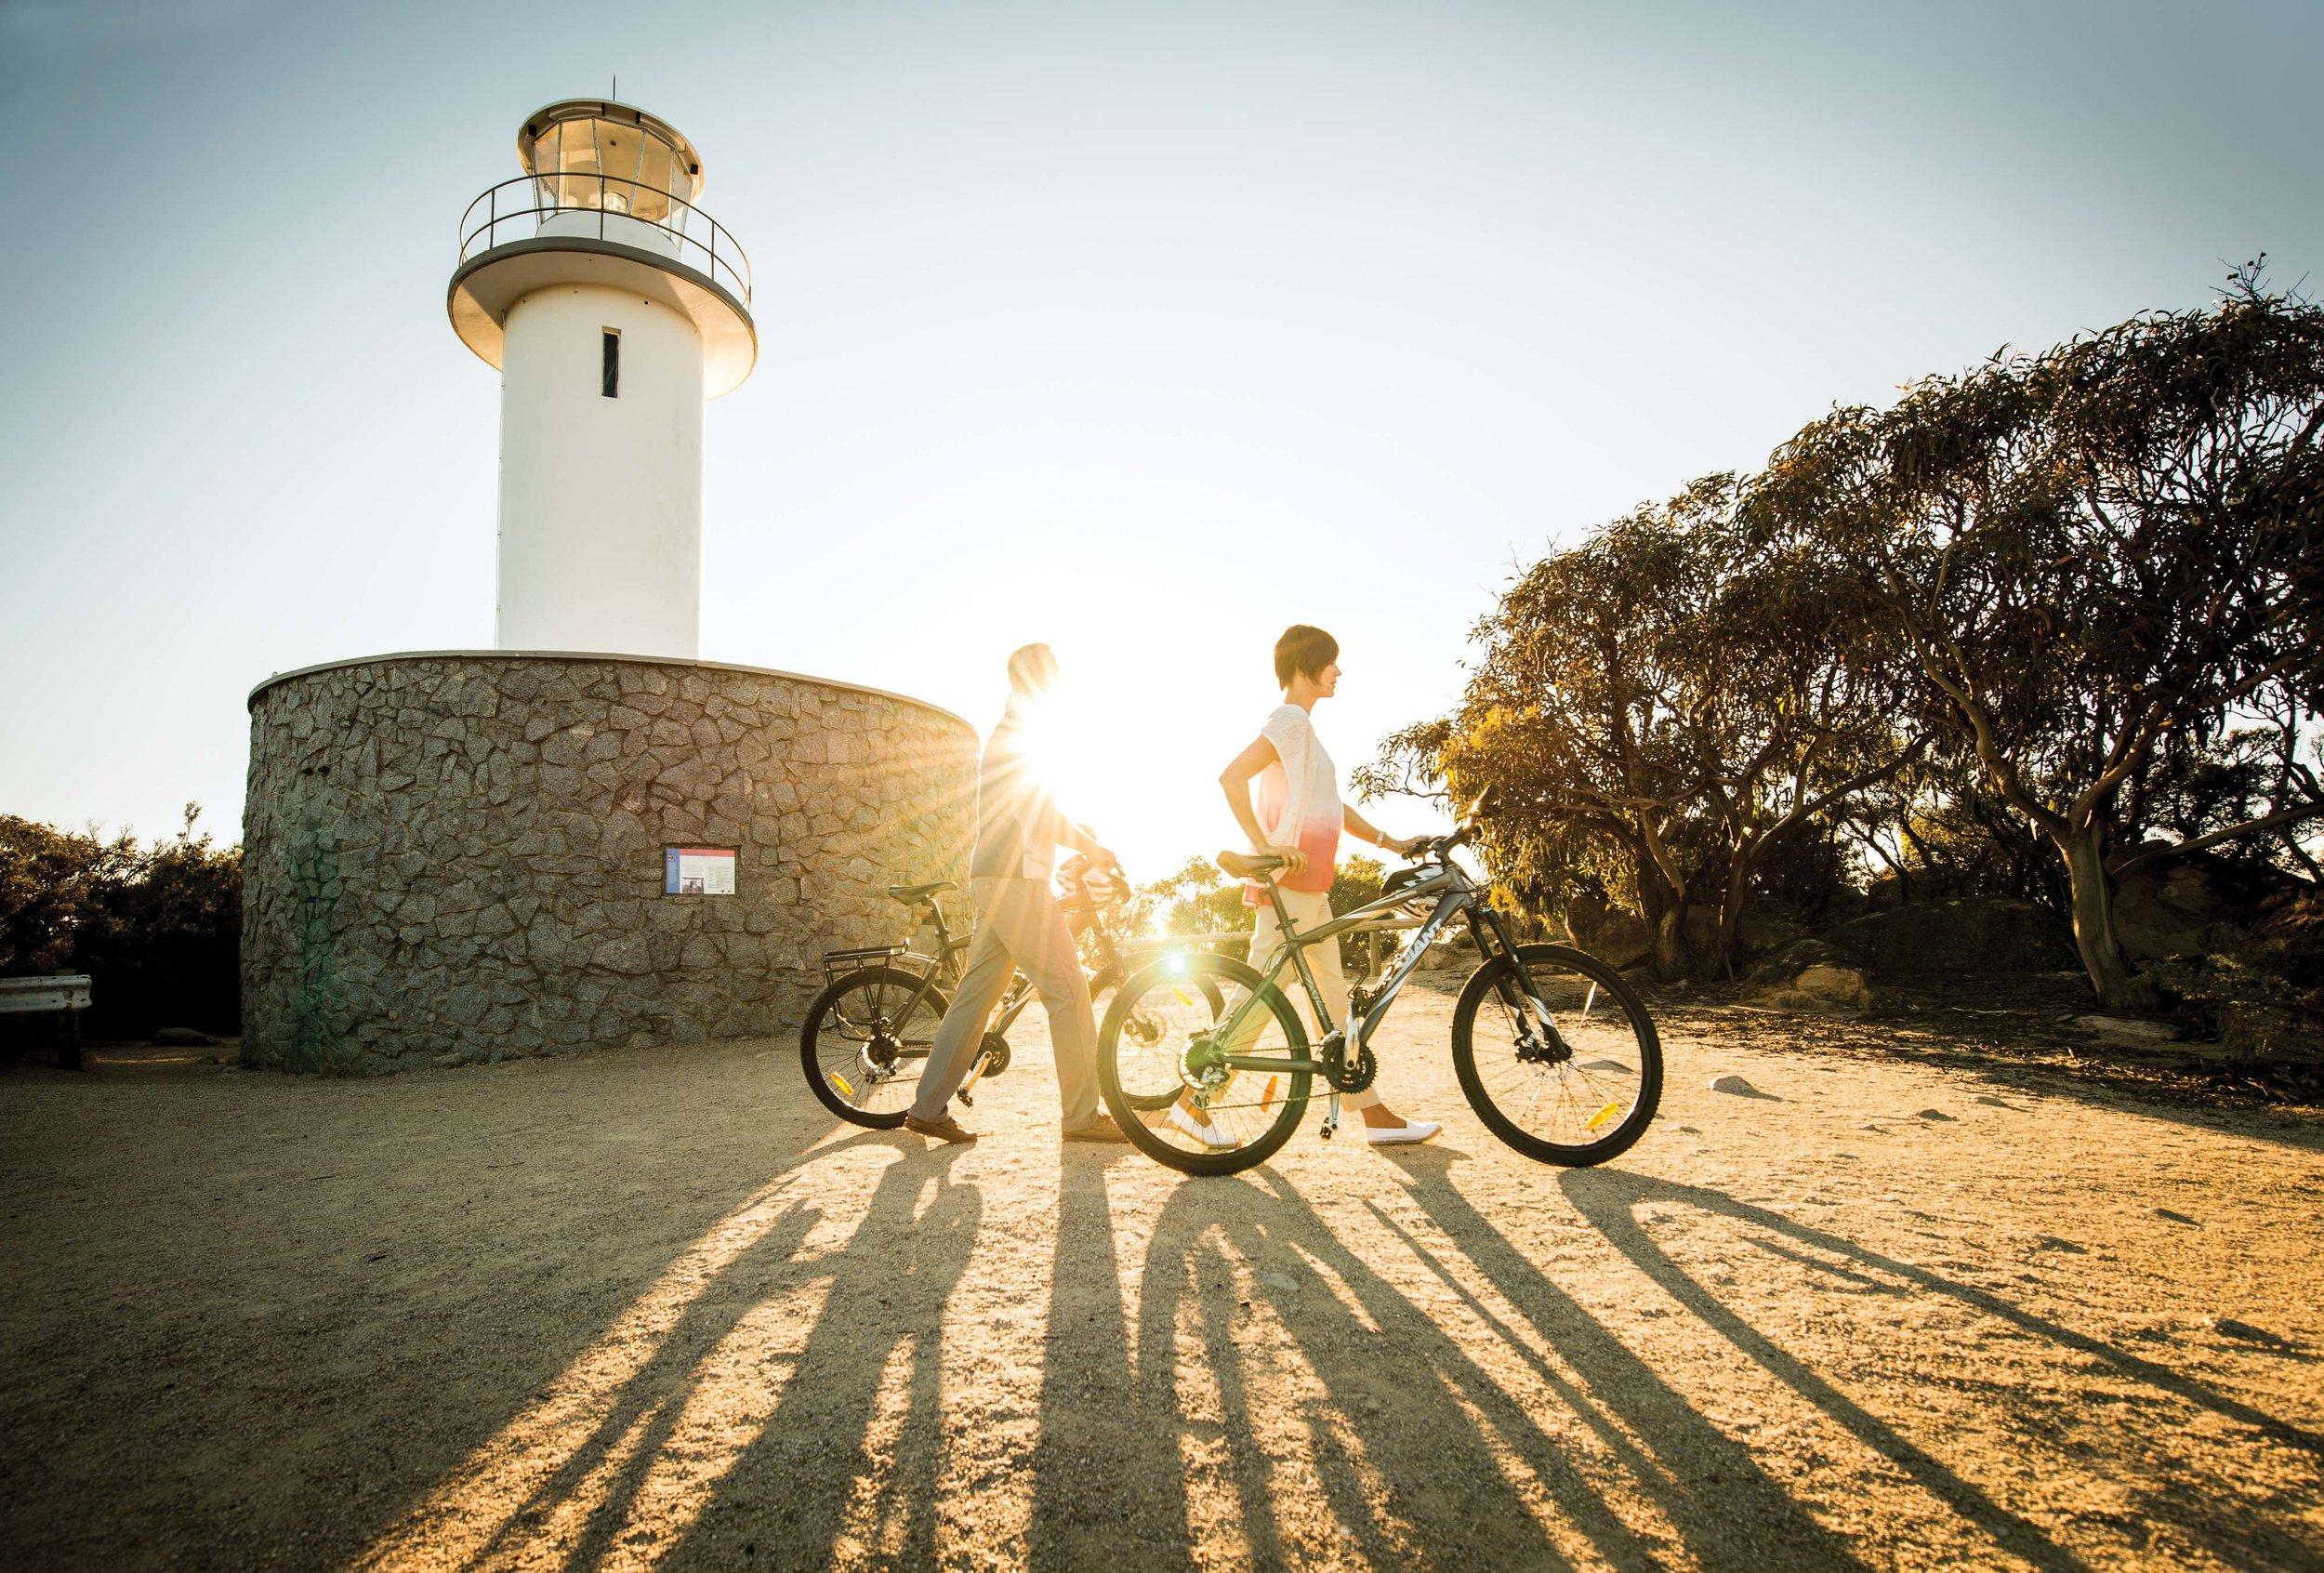 Saffire_Freycinet_Cycling-Lighthouse.jpg